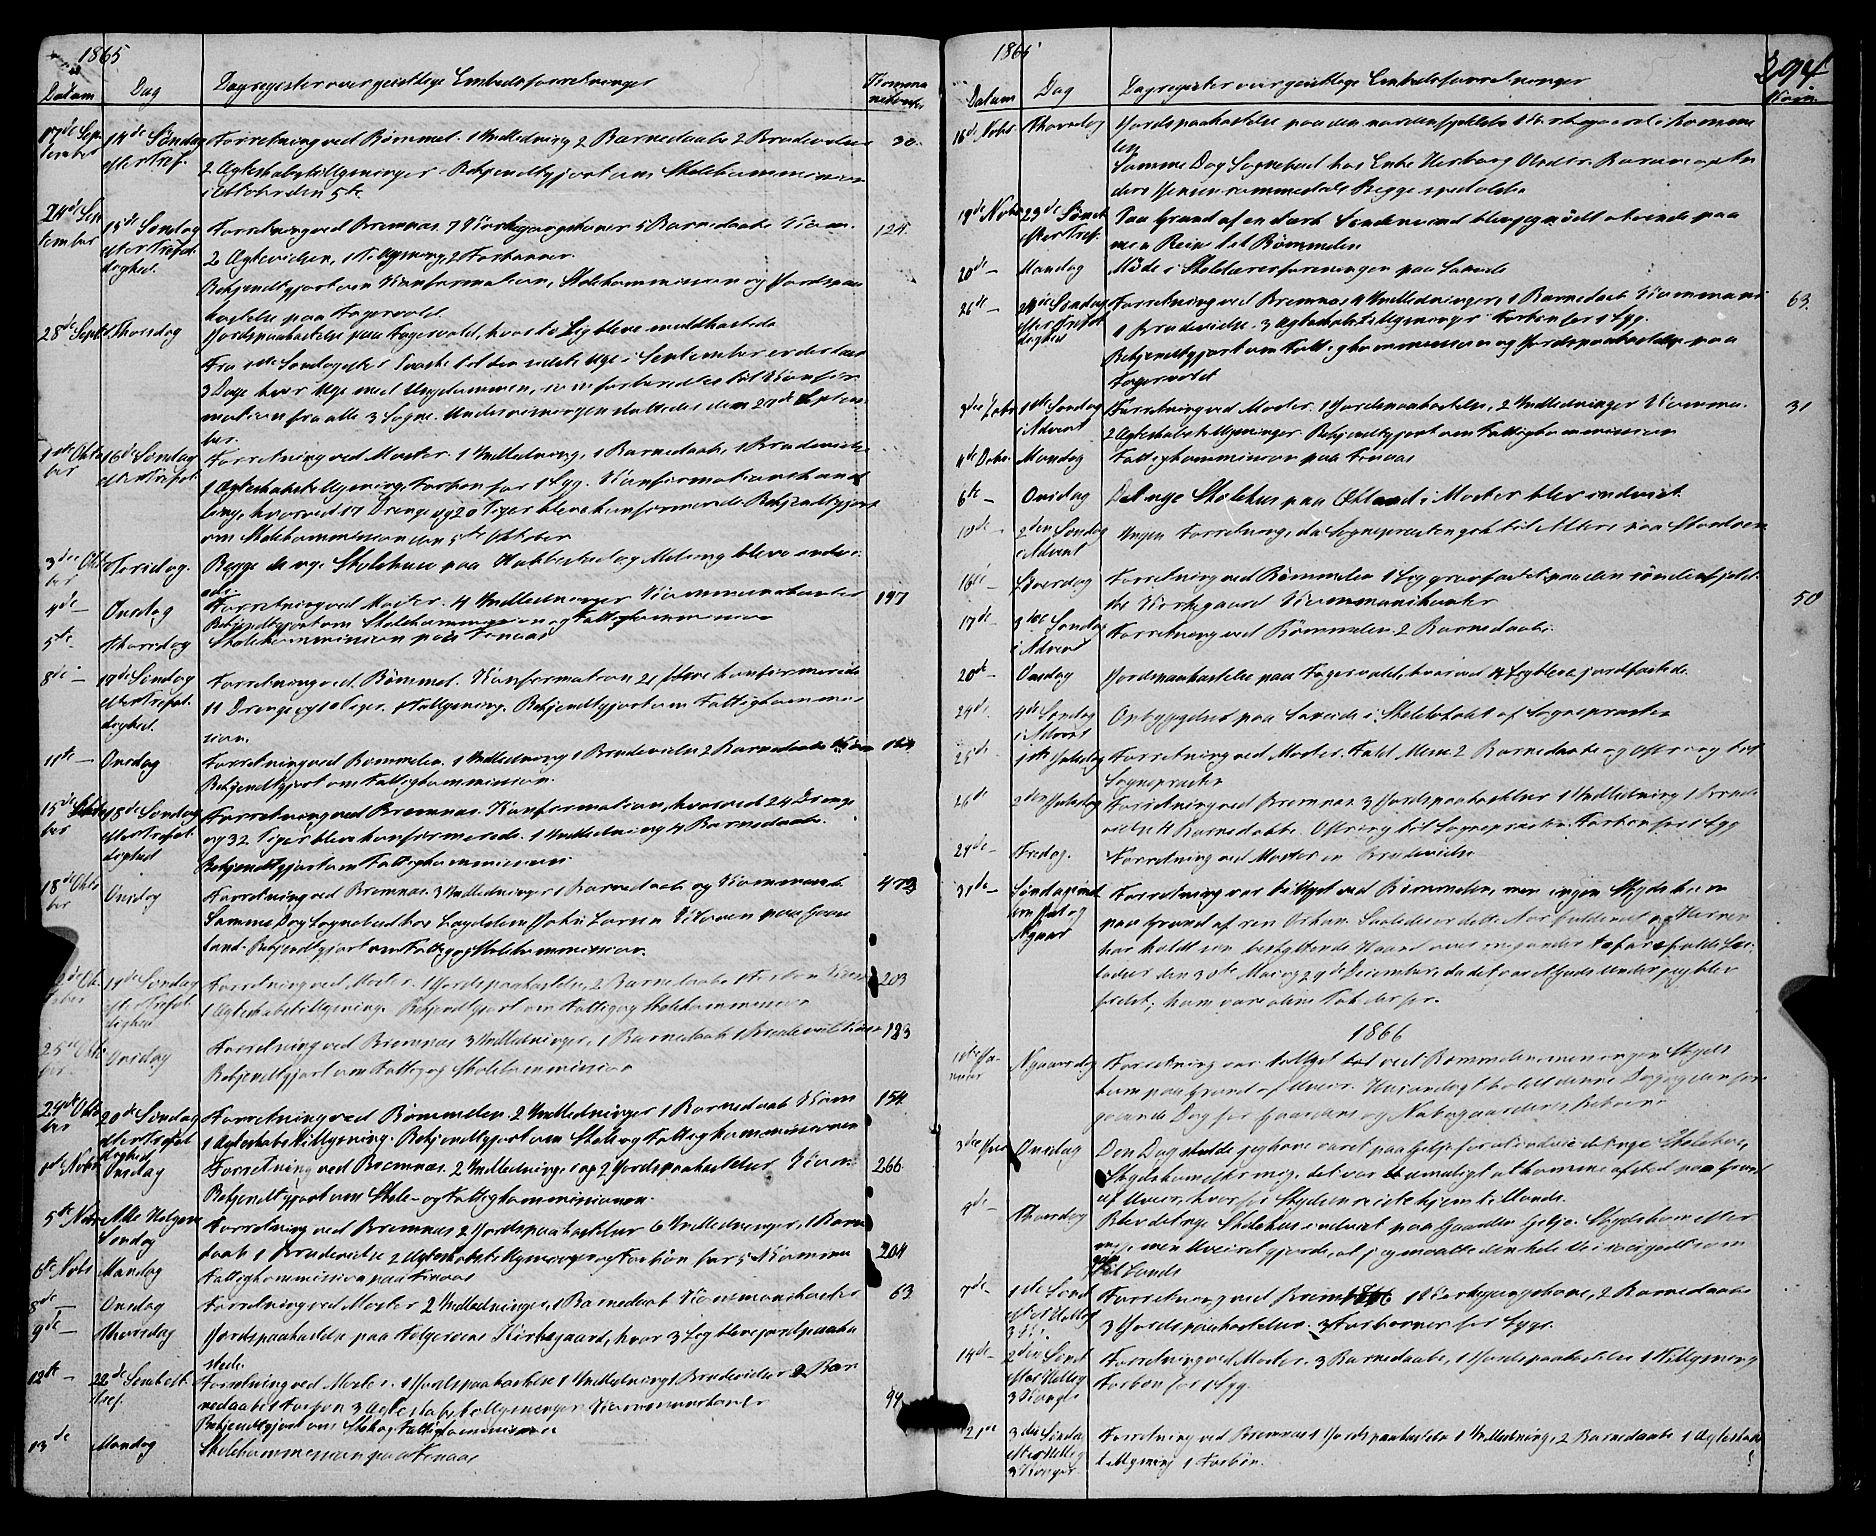 SAB, Finnås sokneprestembete, H/Ha/Haa/Haaa/L0008: Ministerialbok nr. A 8, 1863-1872, s. 294